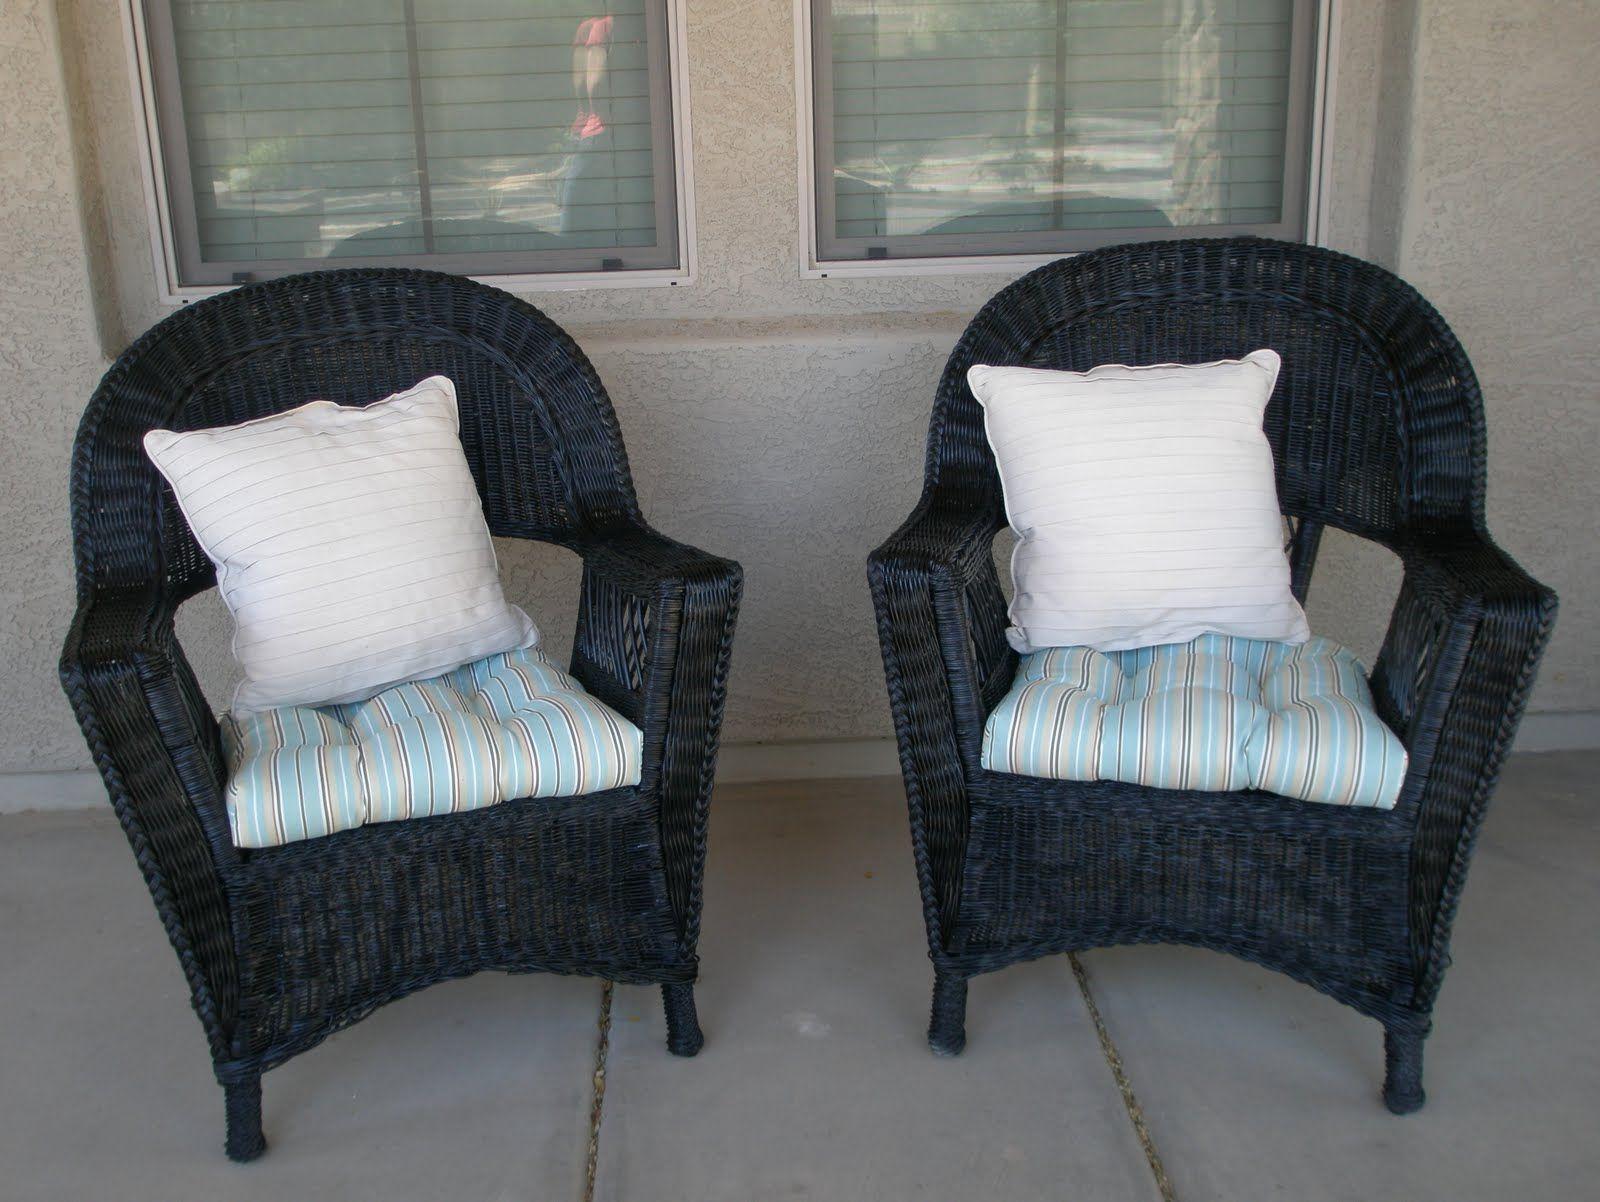 Marvelous Marinu0027s Creations: Wicker Patio Chairs.